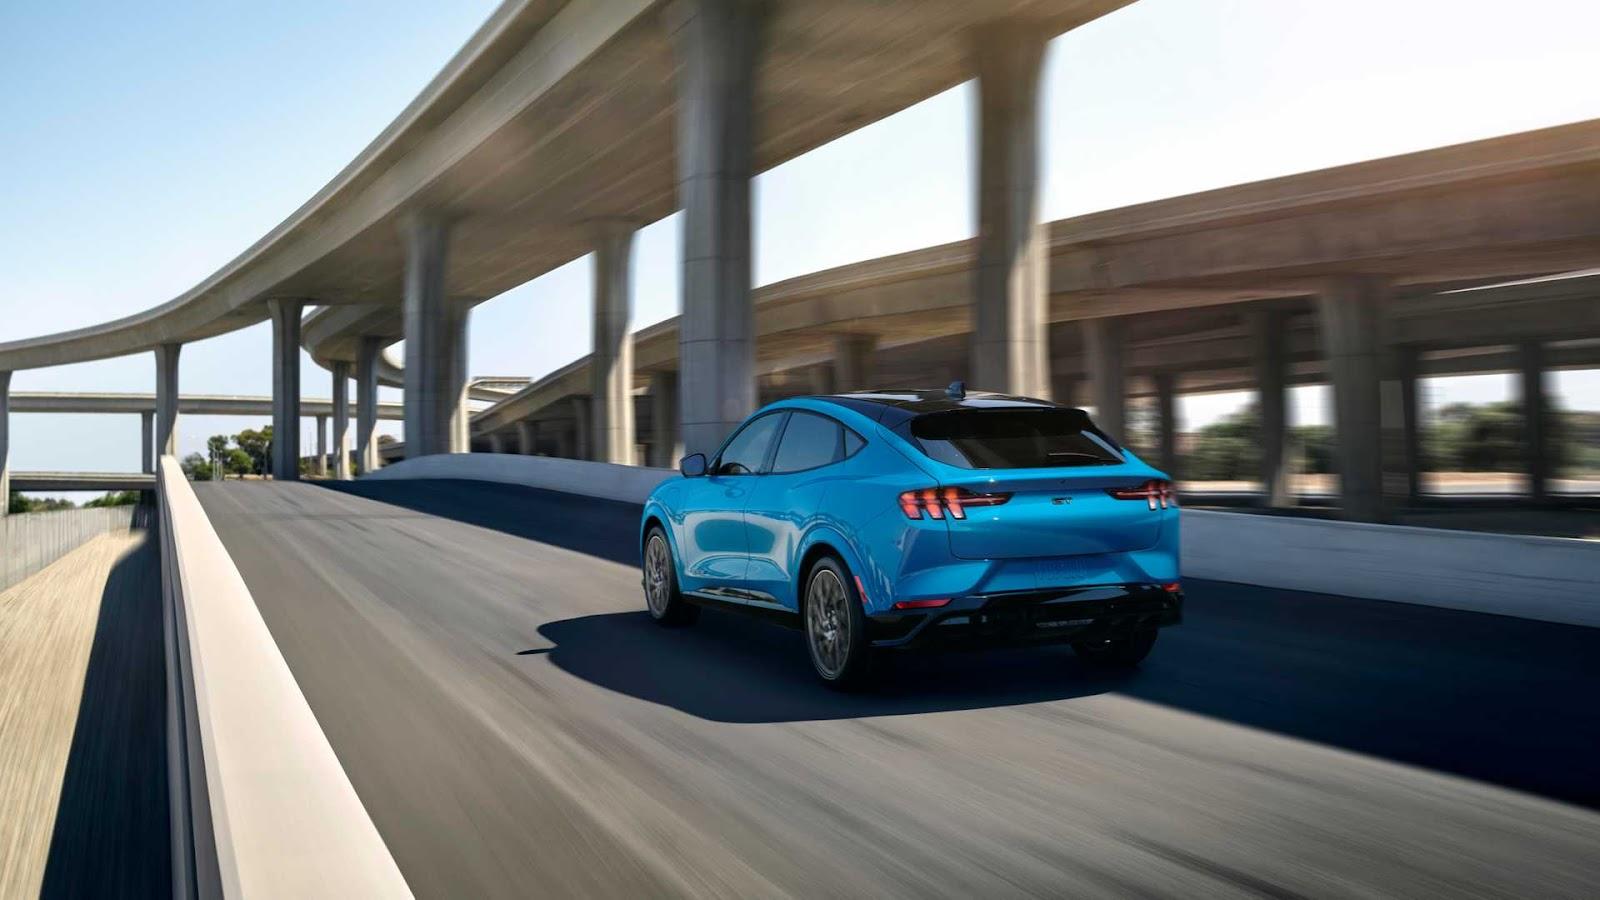 2020-ford-mustang-mach-e-1.jpg